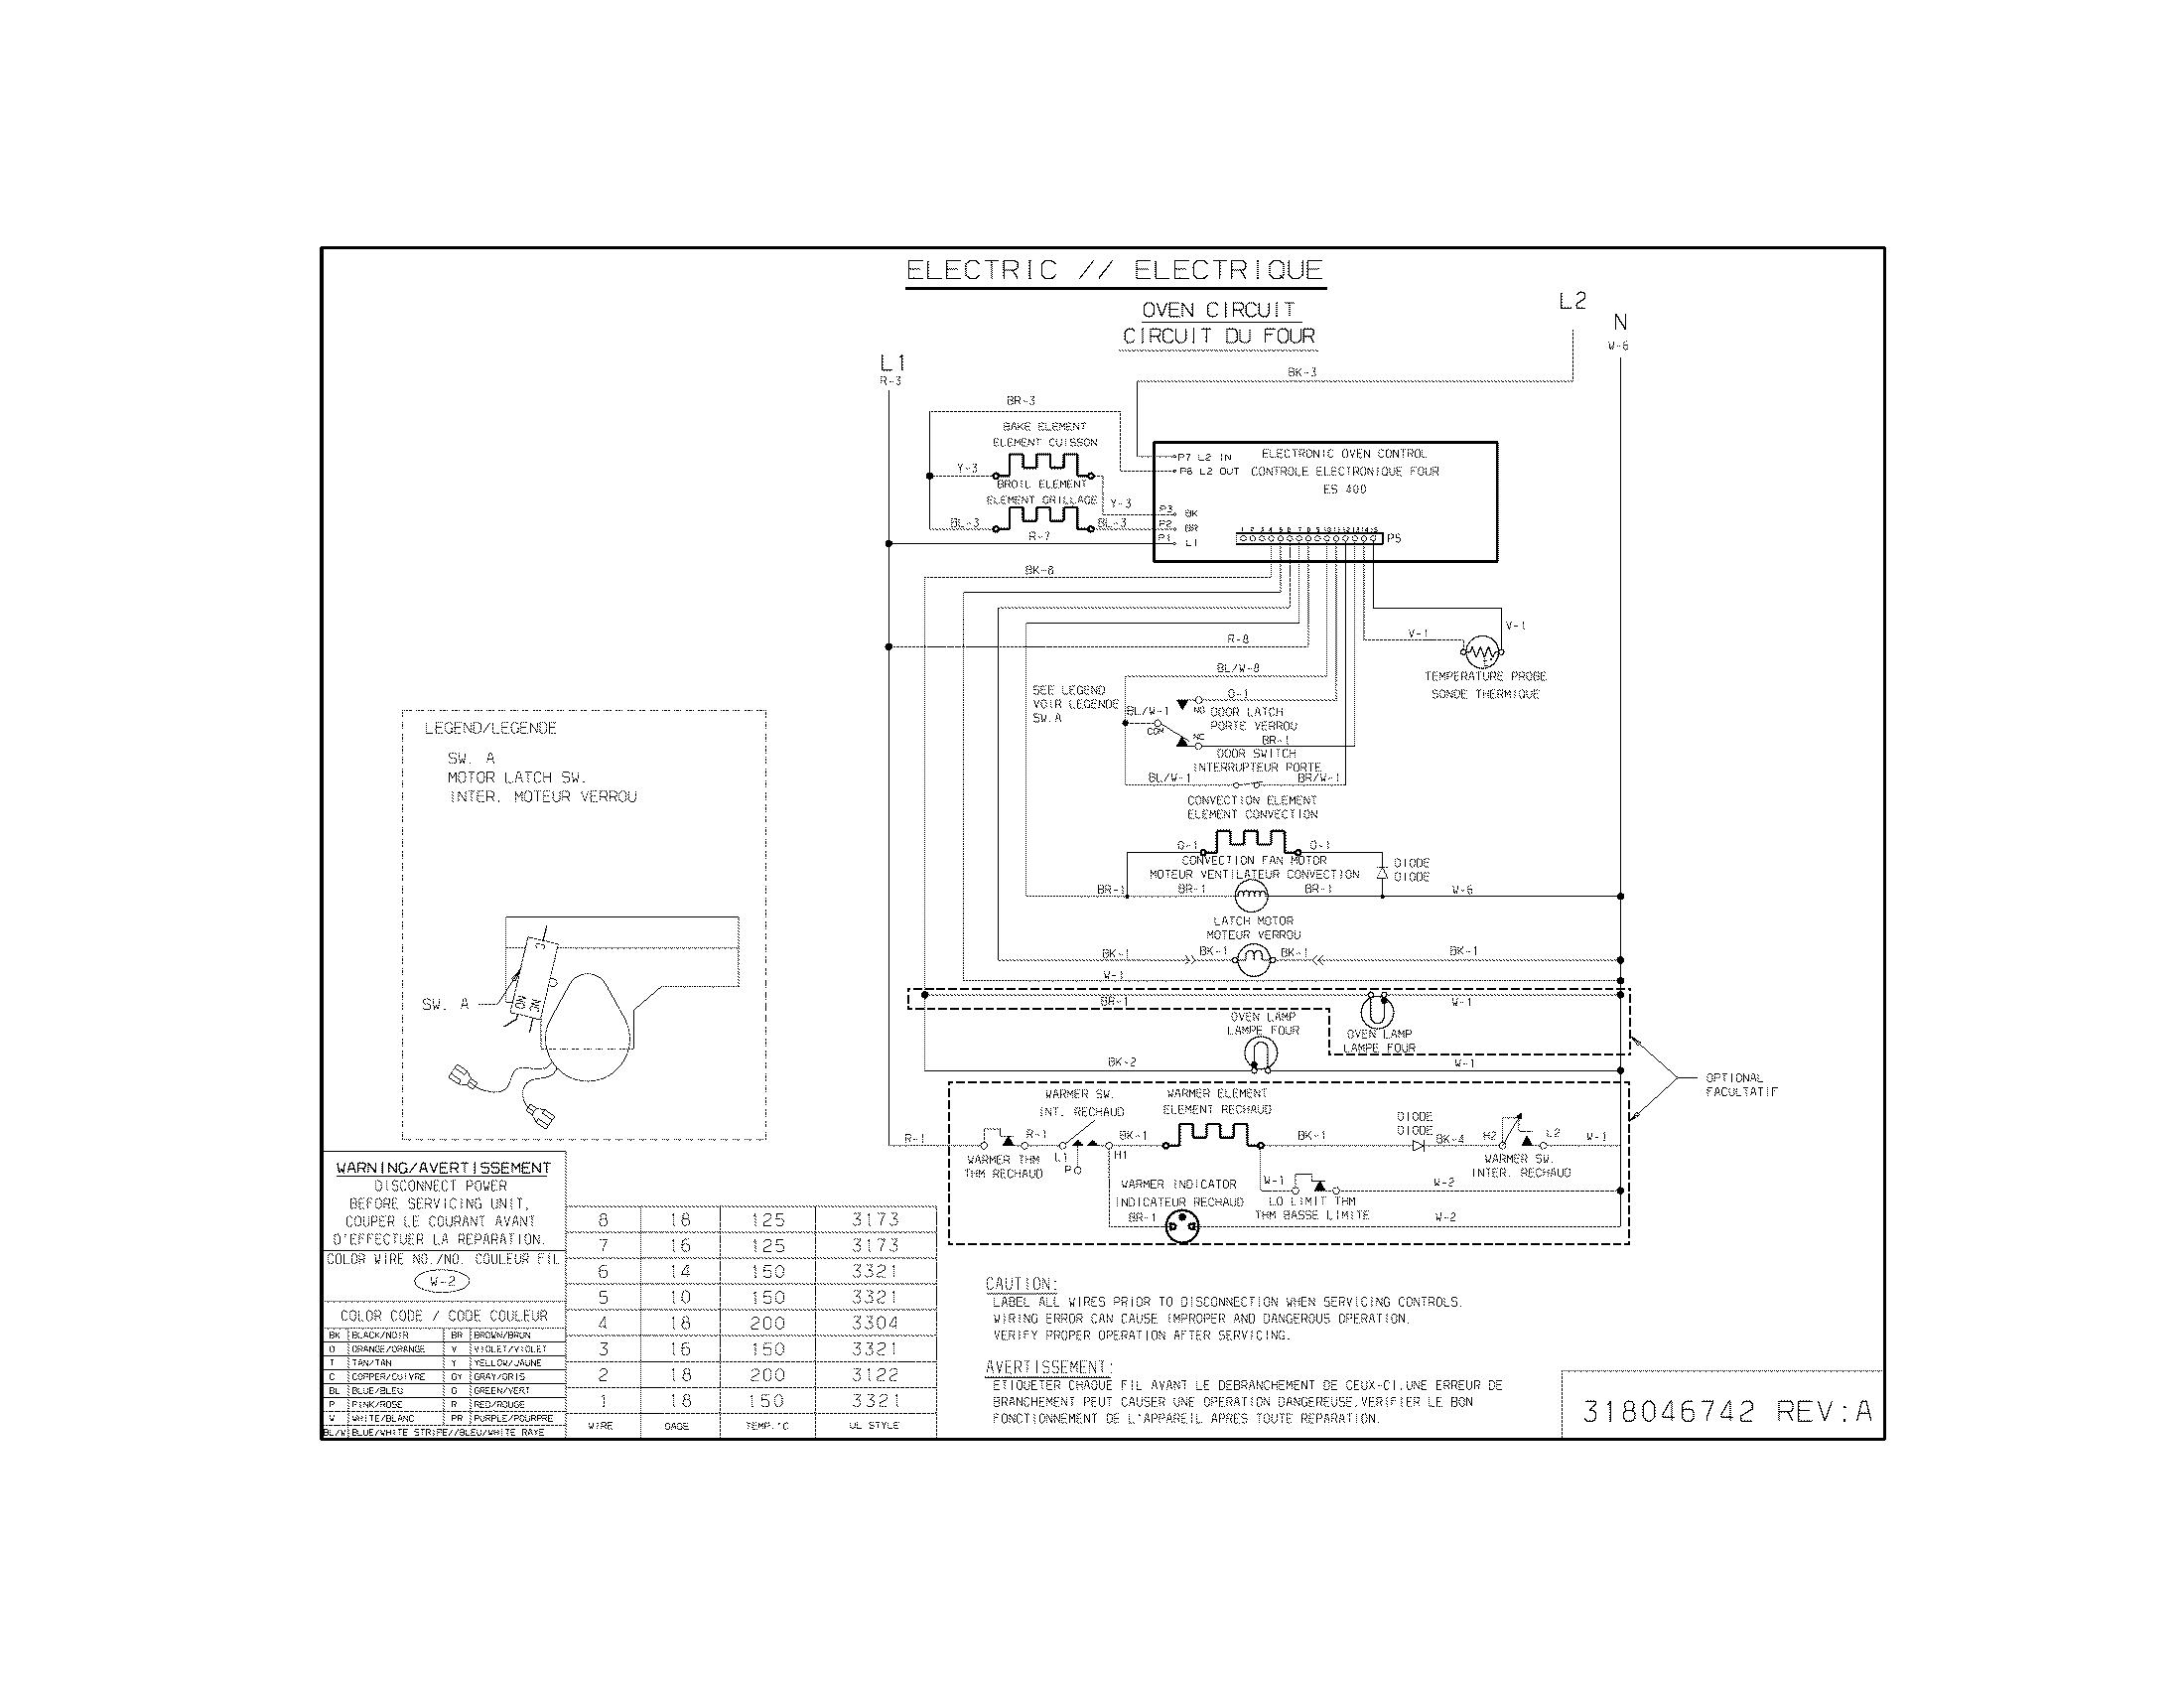 Bobcat 863 Parts Diagram - Wiring Diagrams Dock